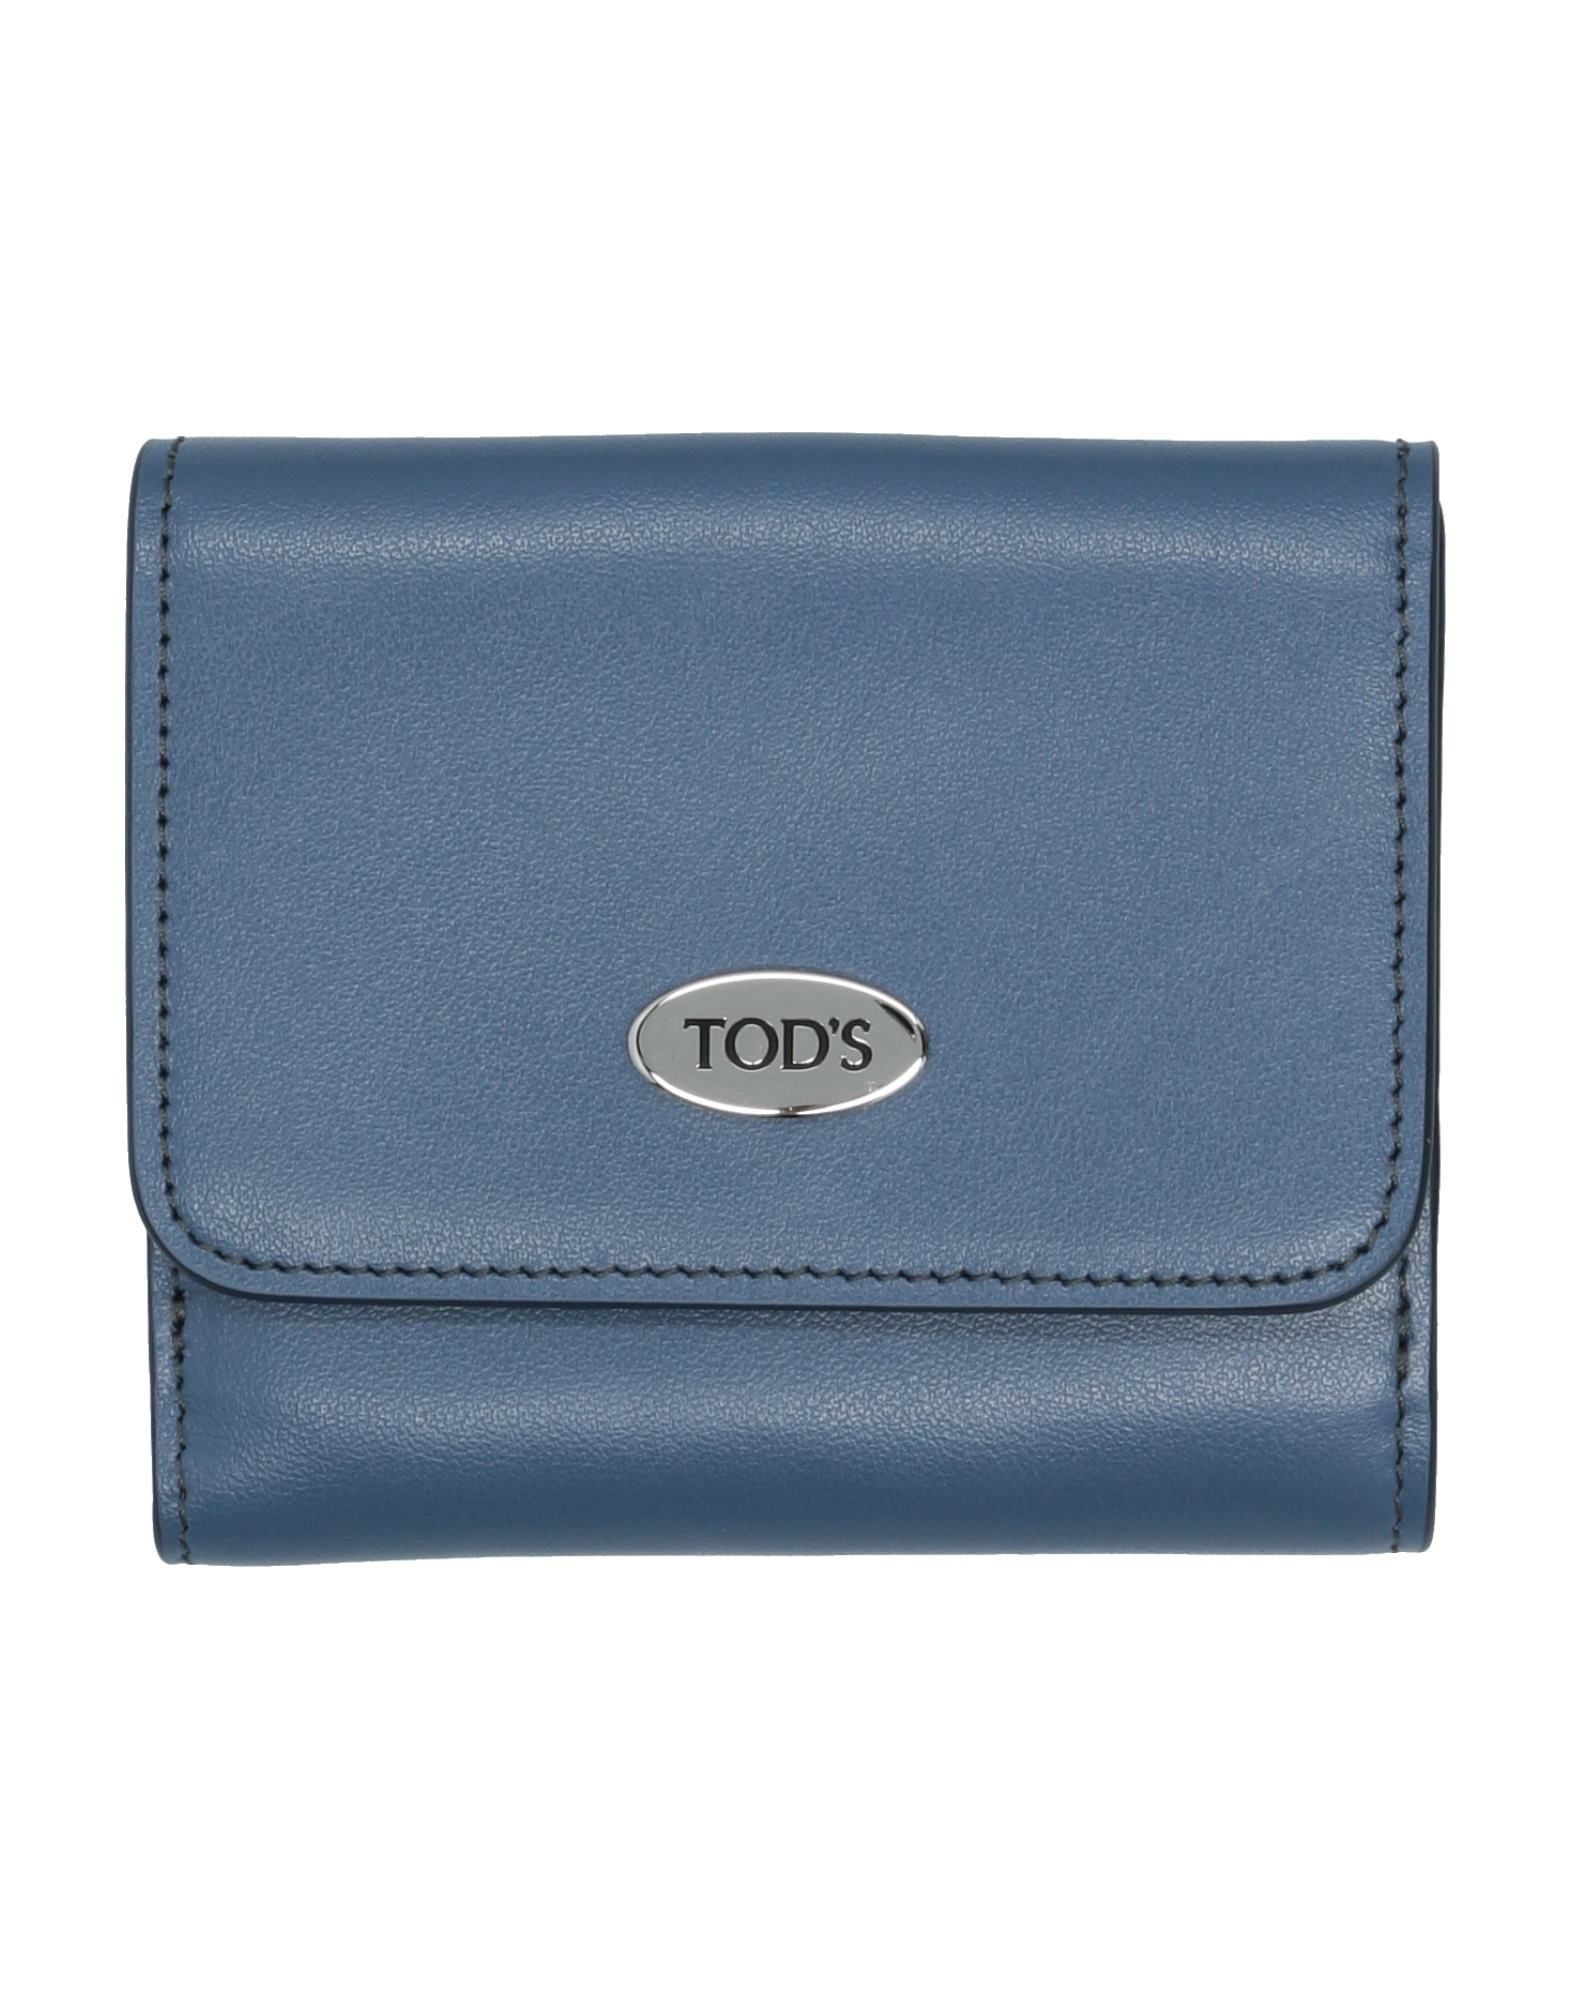 Фото - TOD'S Бумажник tua by braccialini бумажник